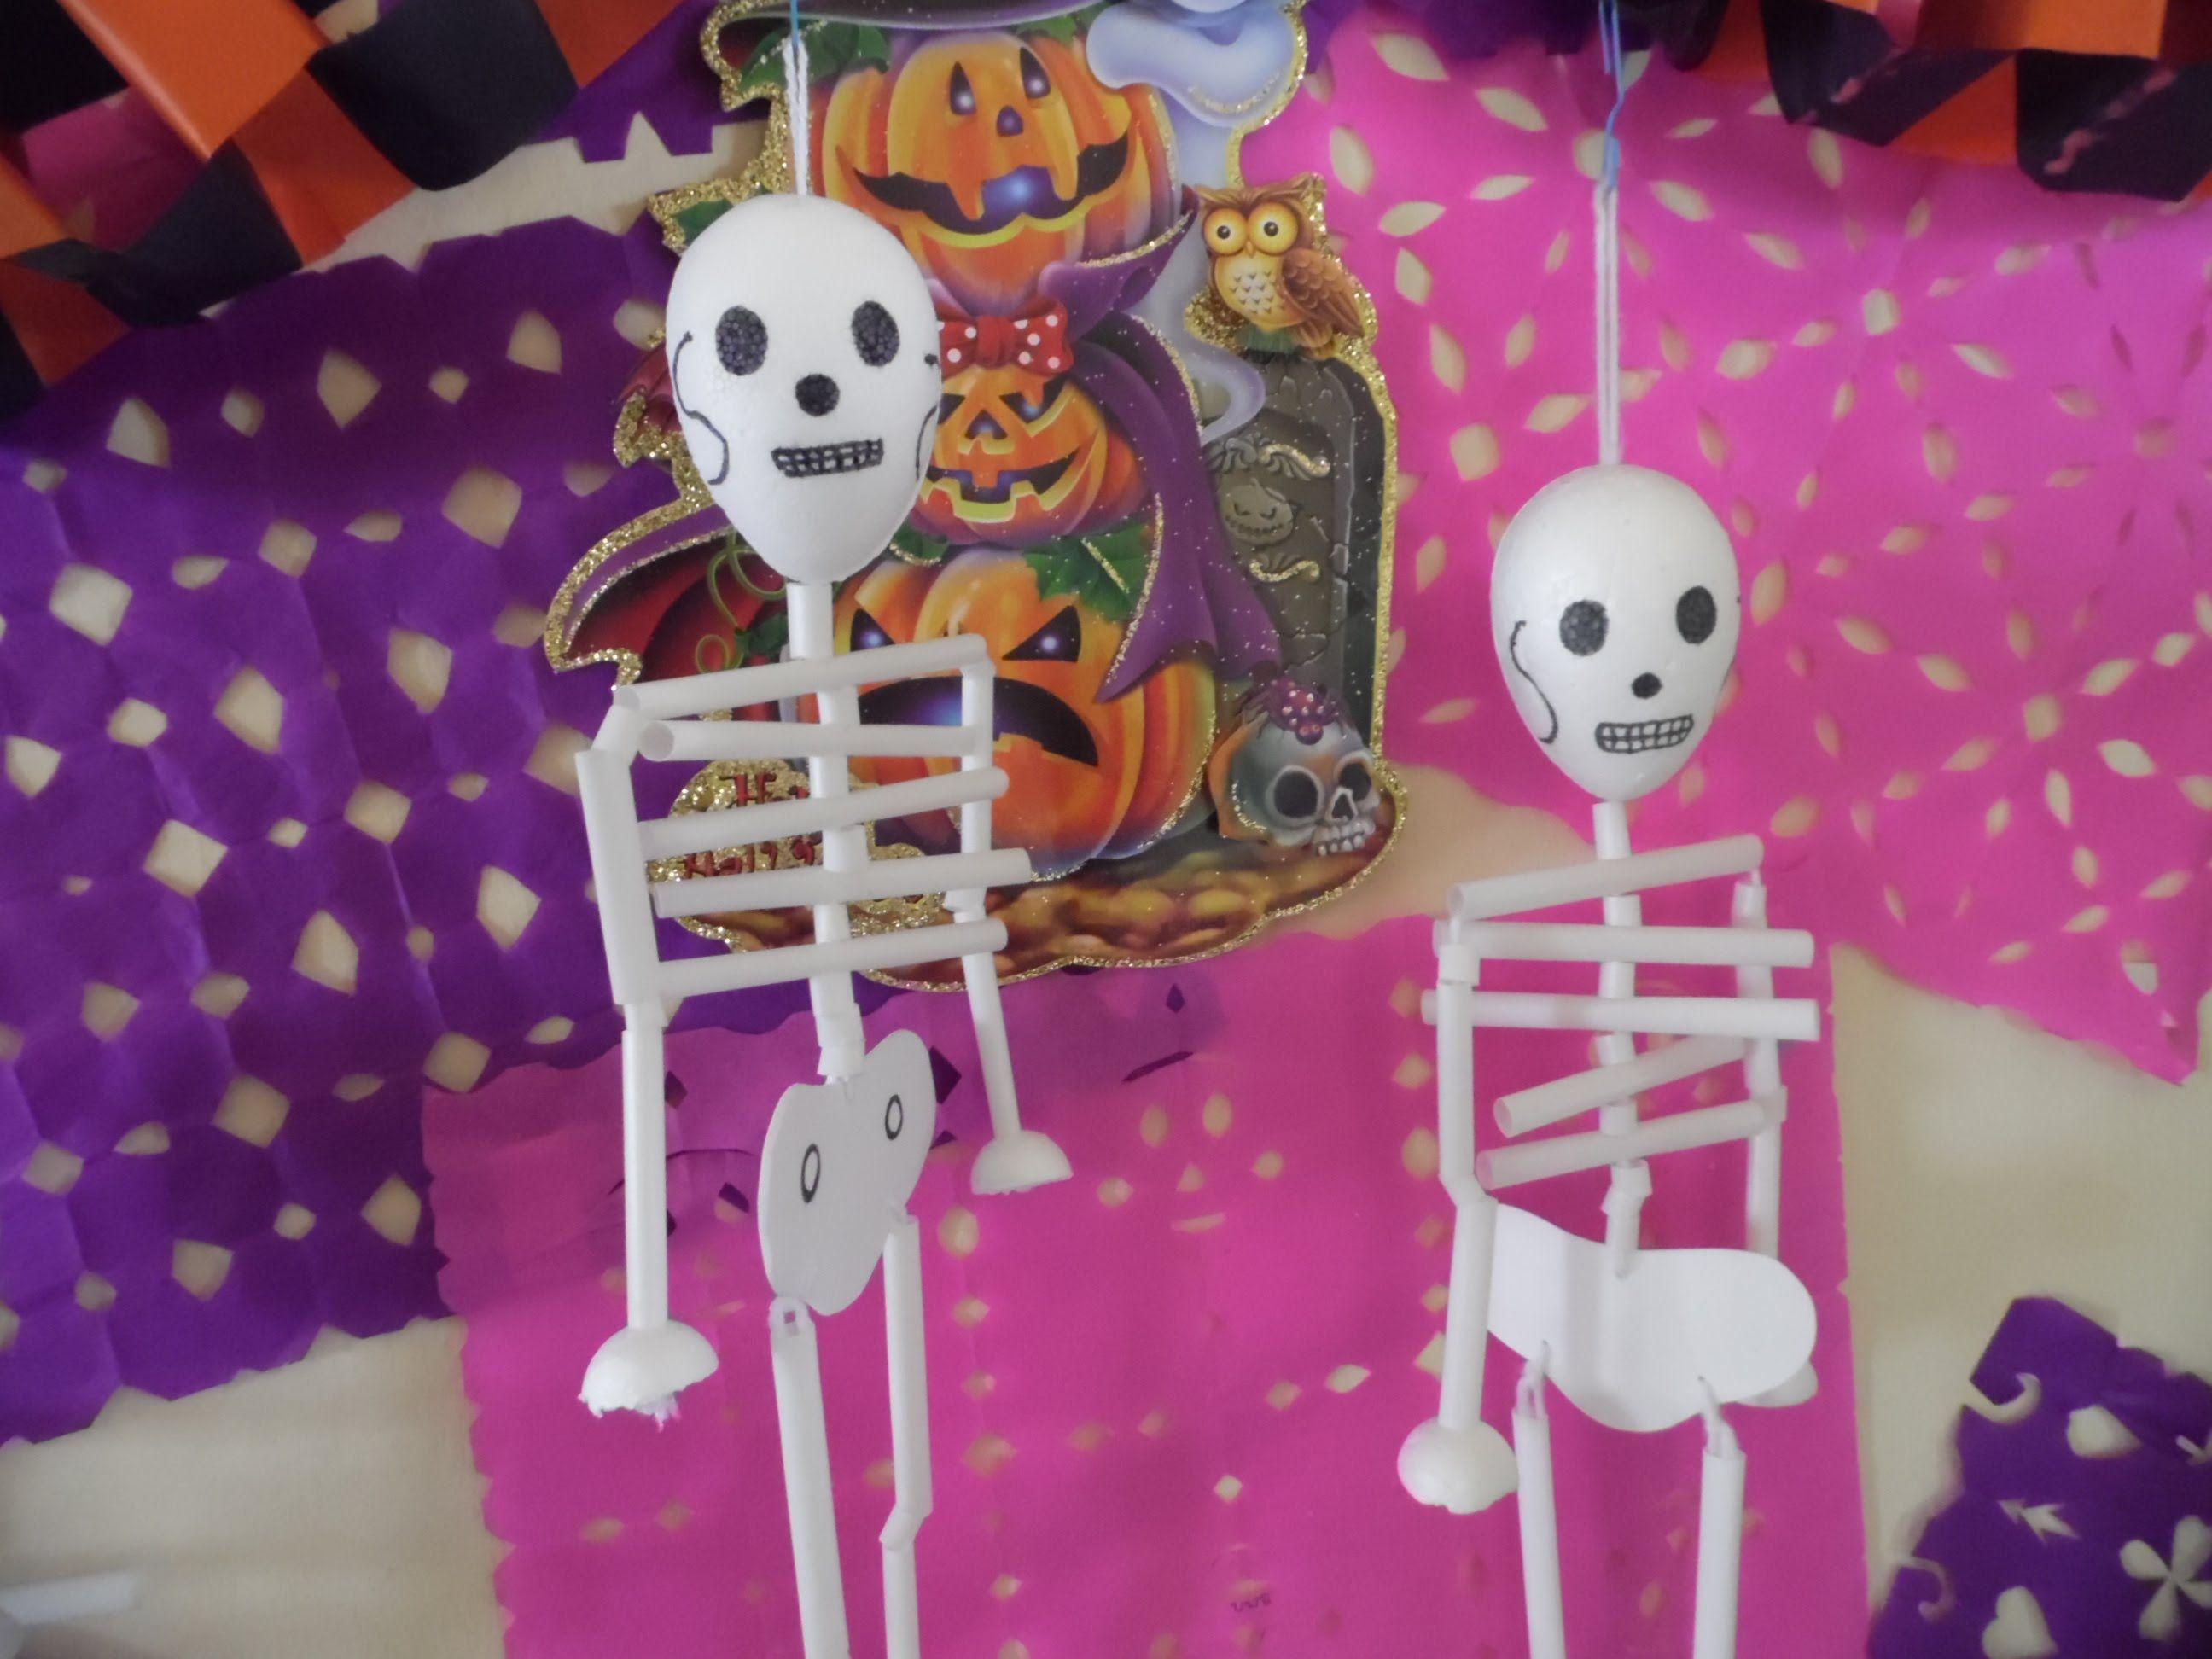 Calacas idea de decoraci n para halloween halloween - Decoracion de halloween ...